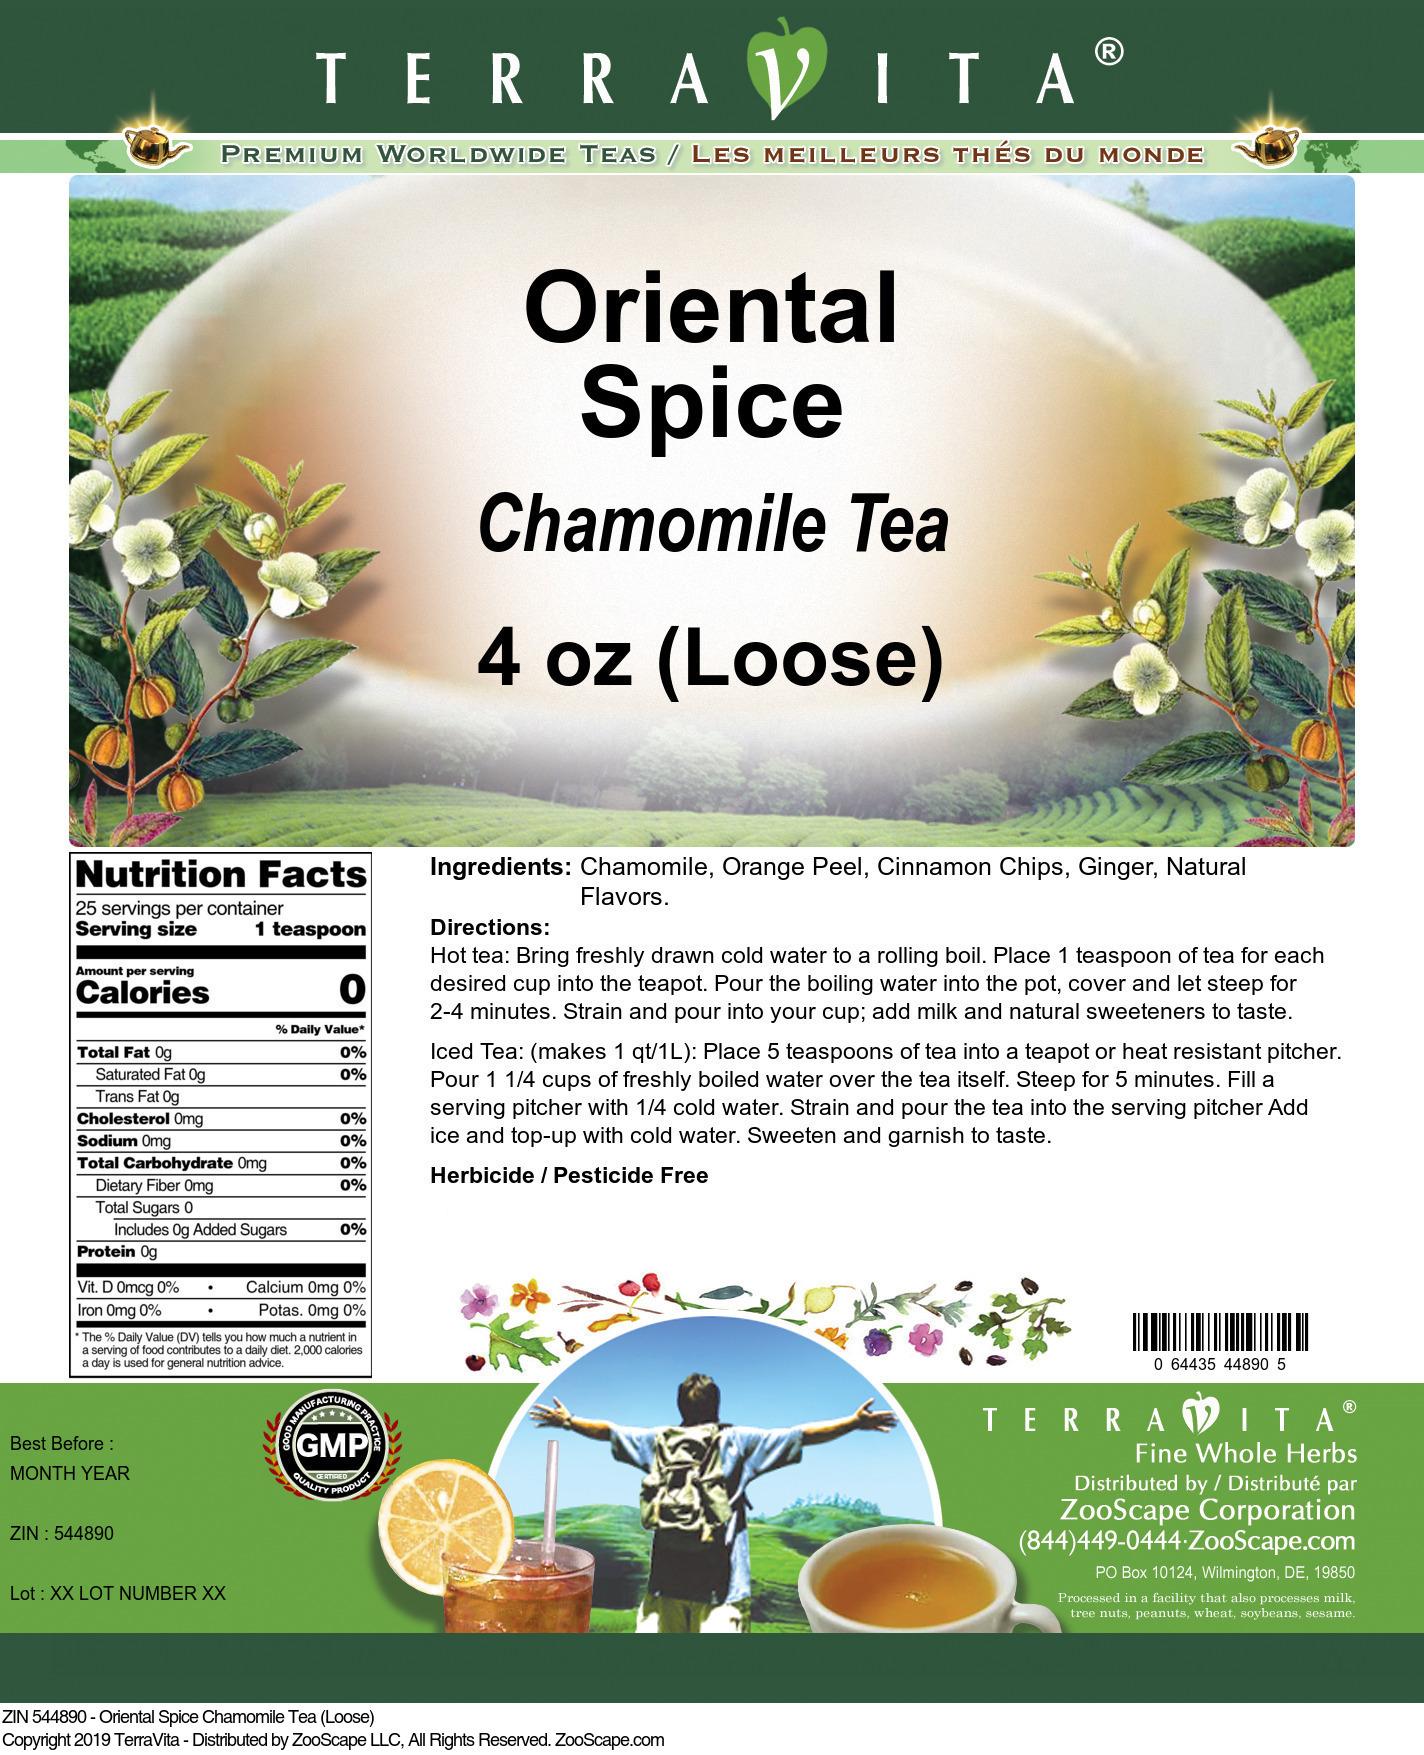 Oriental Spice Chamomile Tea (Loose)